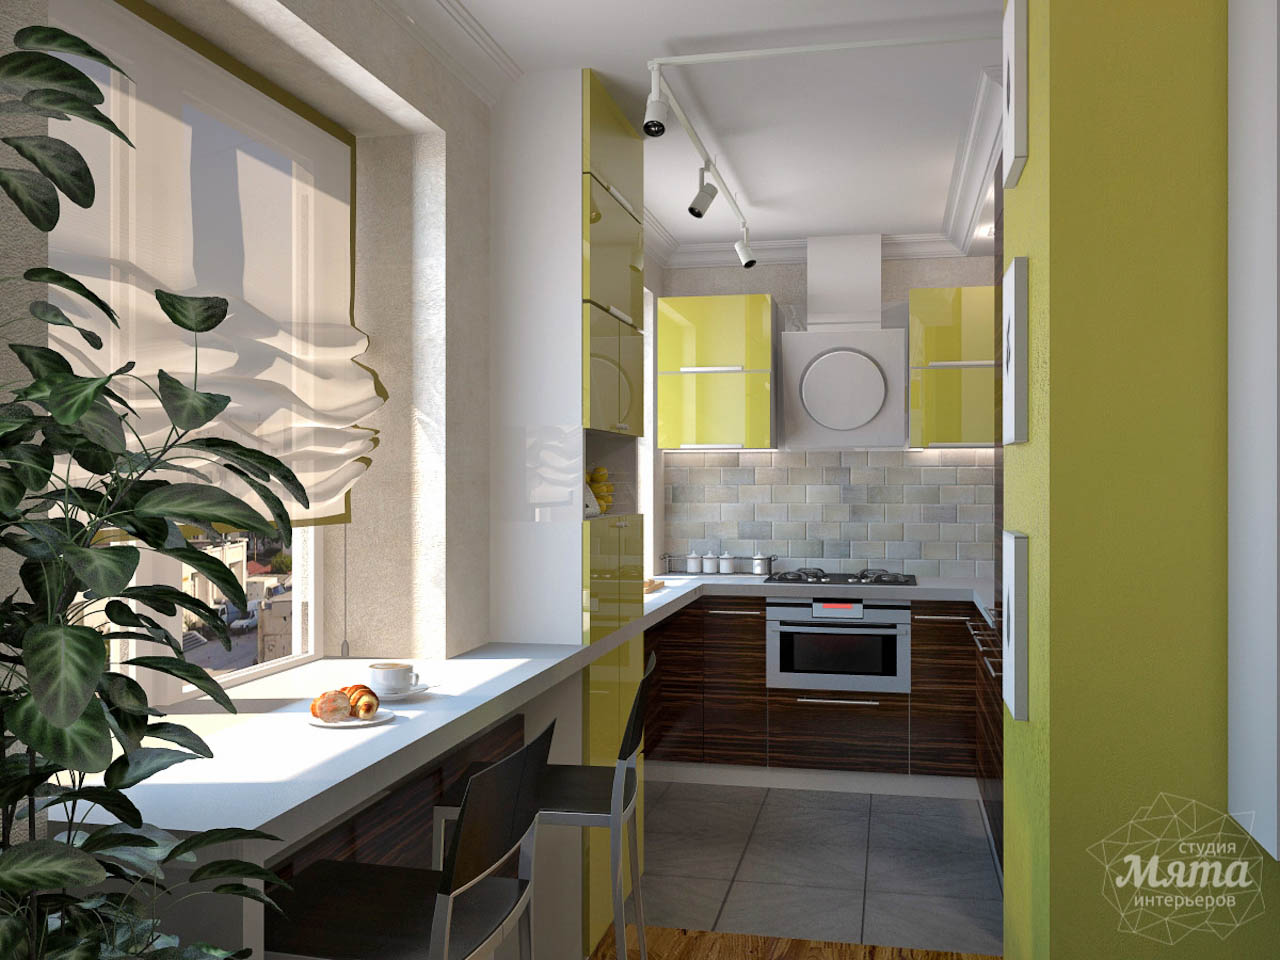 Дизайн интерьера двухкомнатной квартиры по ул. Комсомольская 14 img313097150